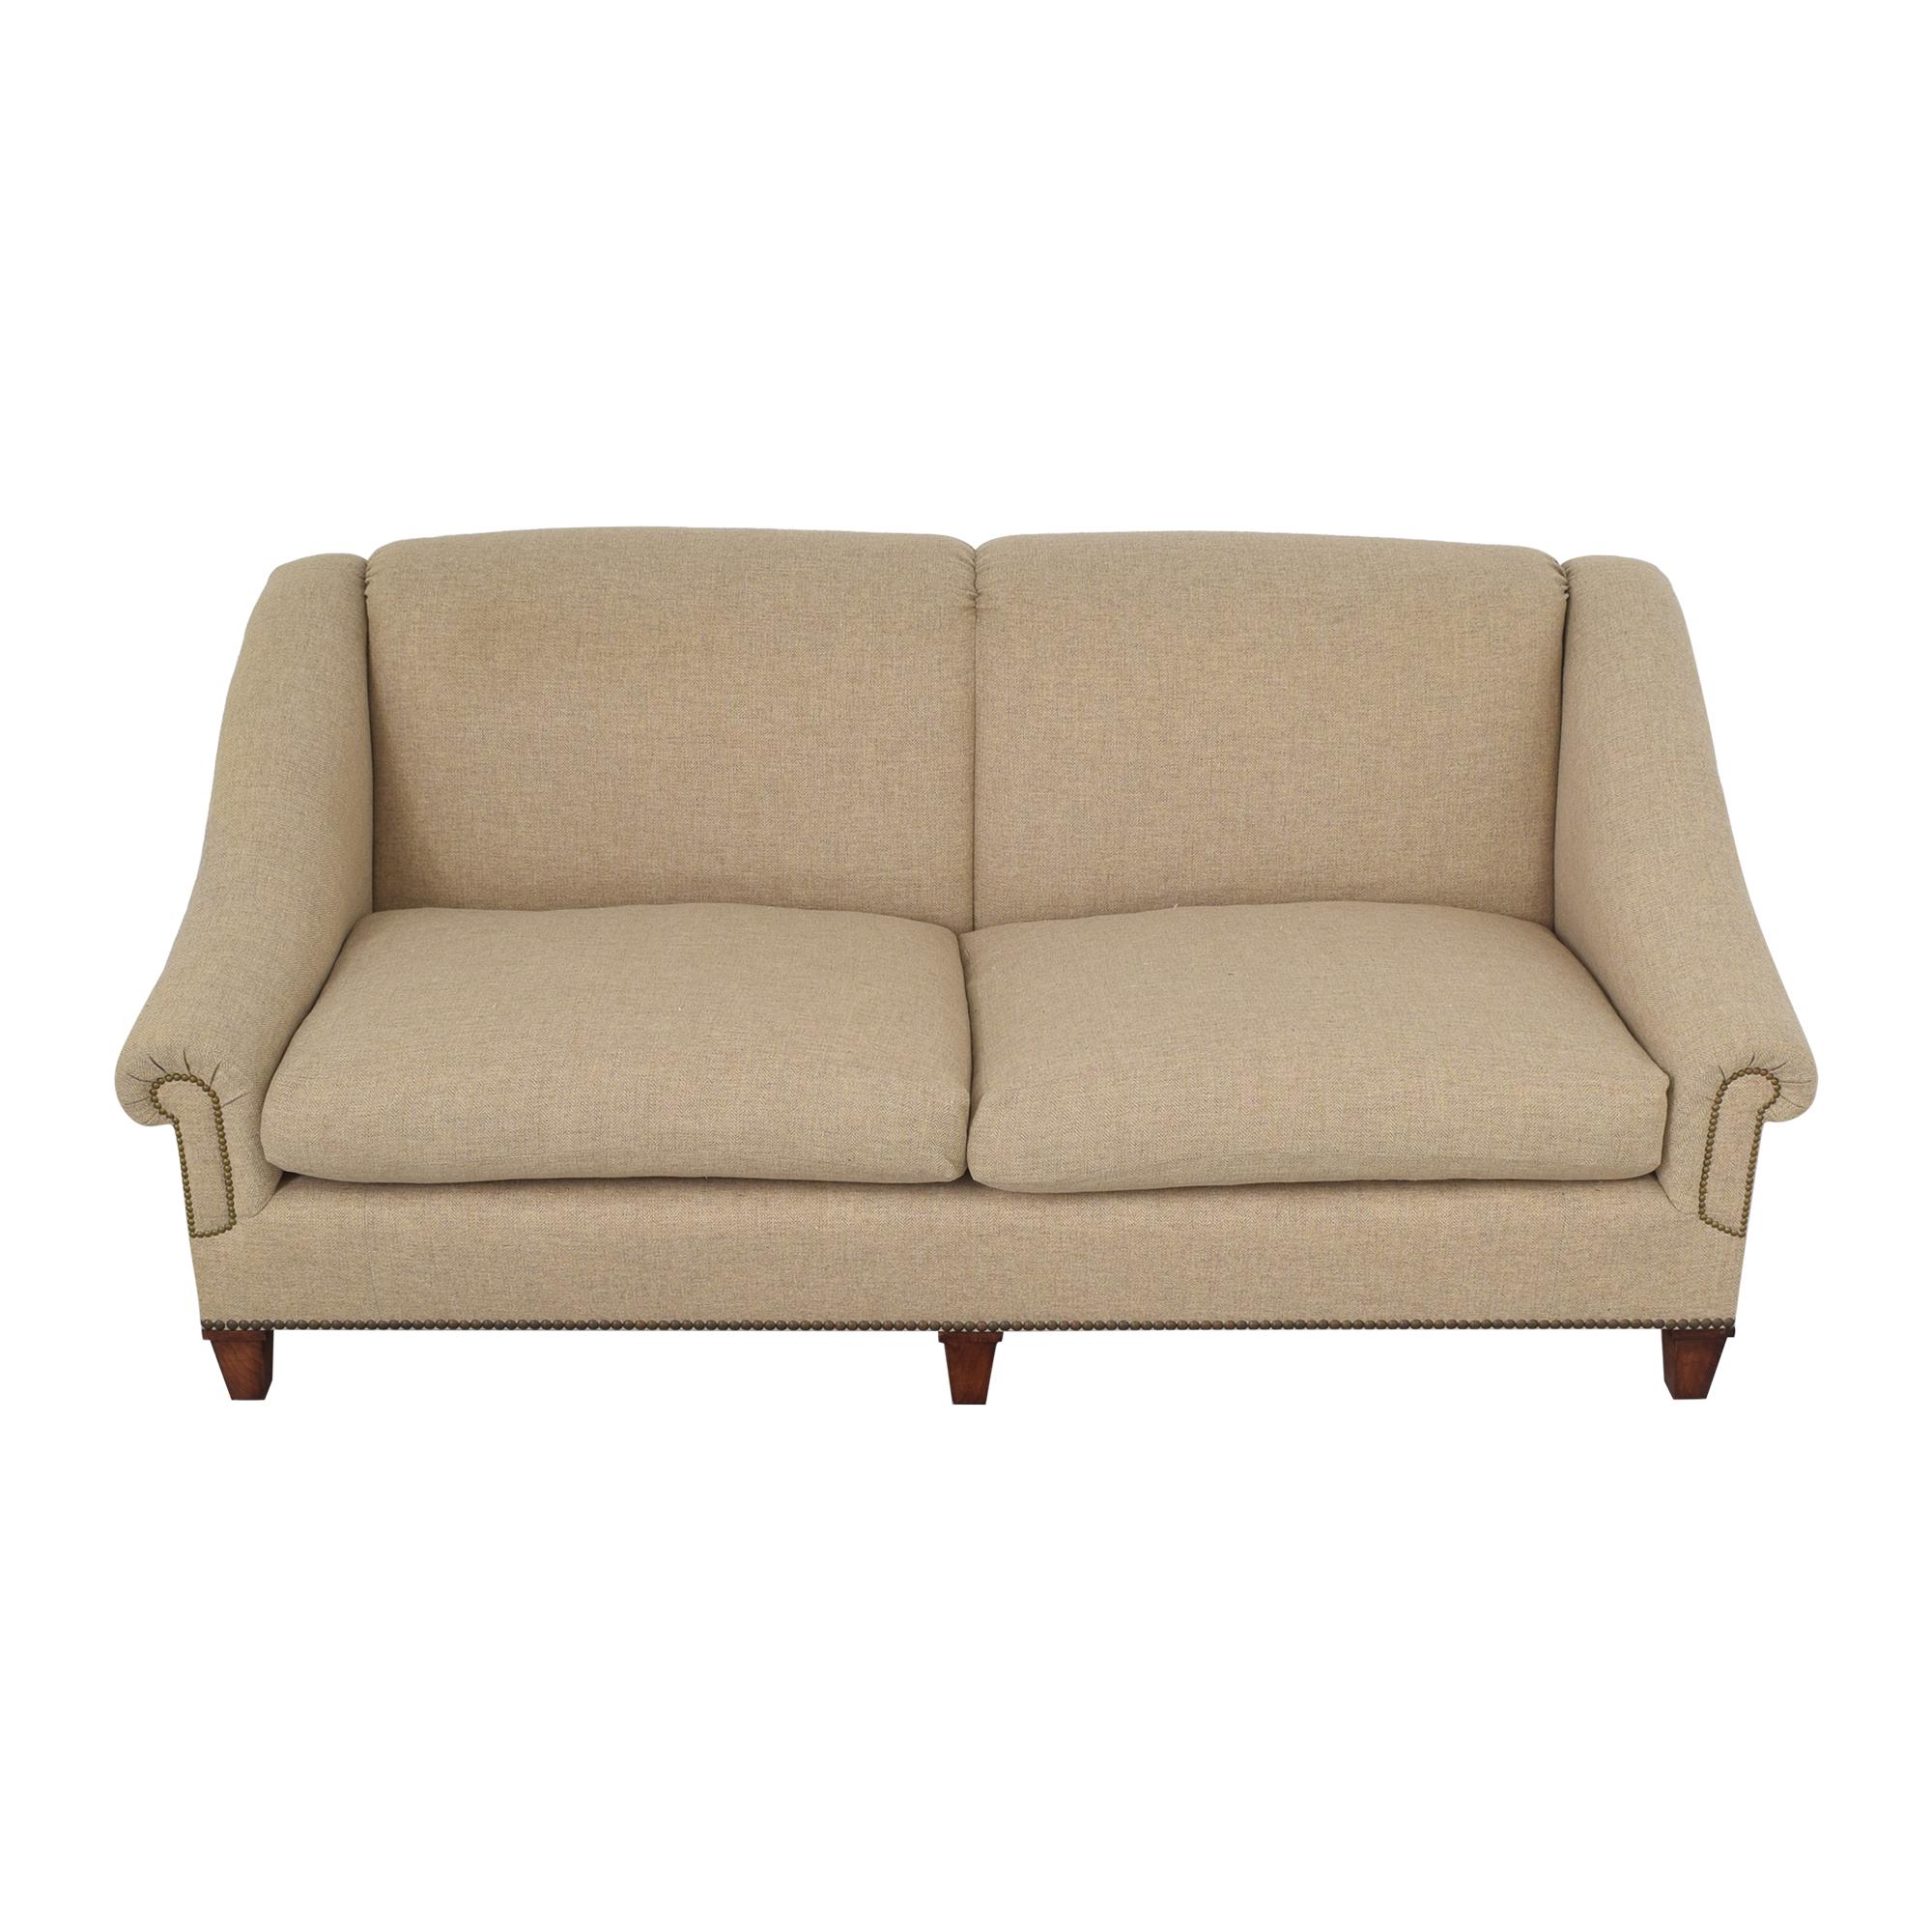 Custom Three Seat Sofa dimensions